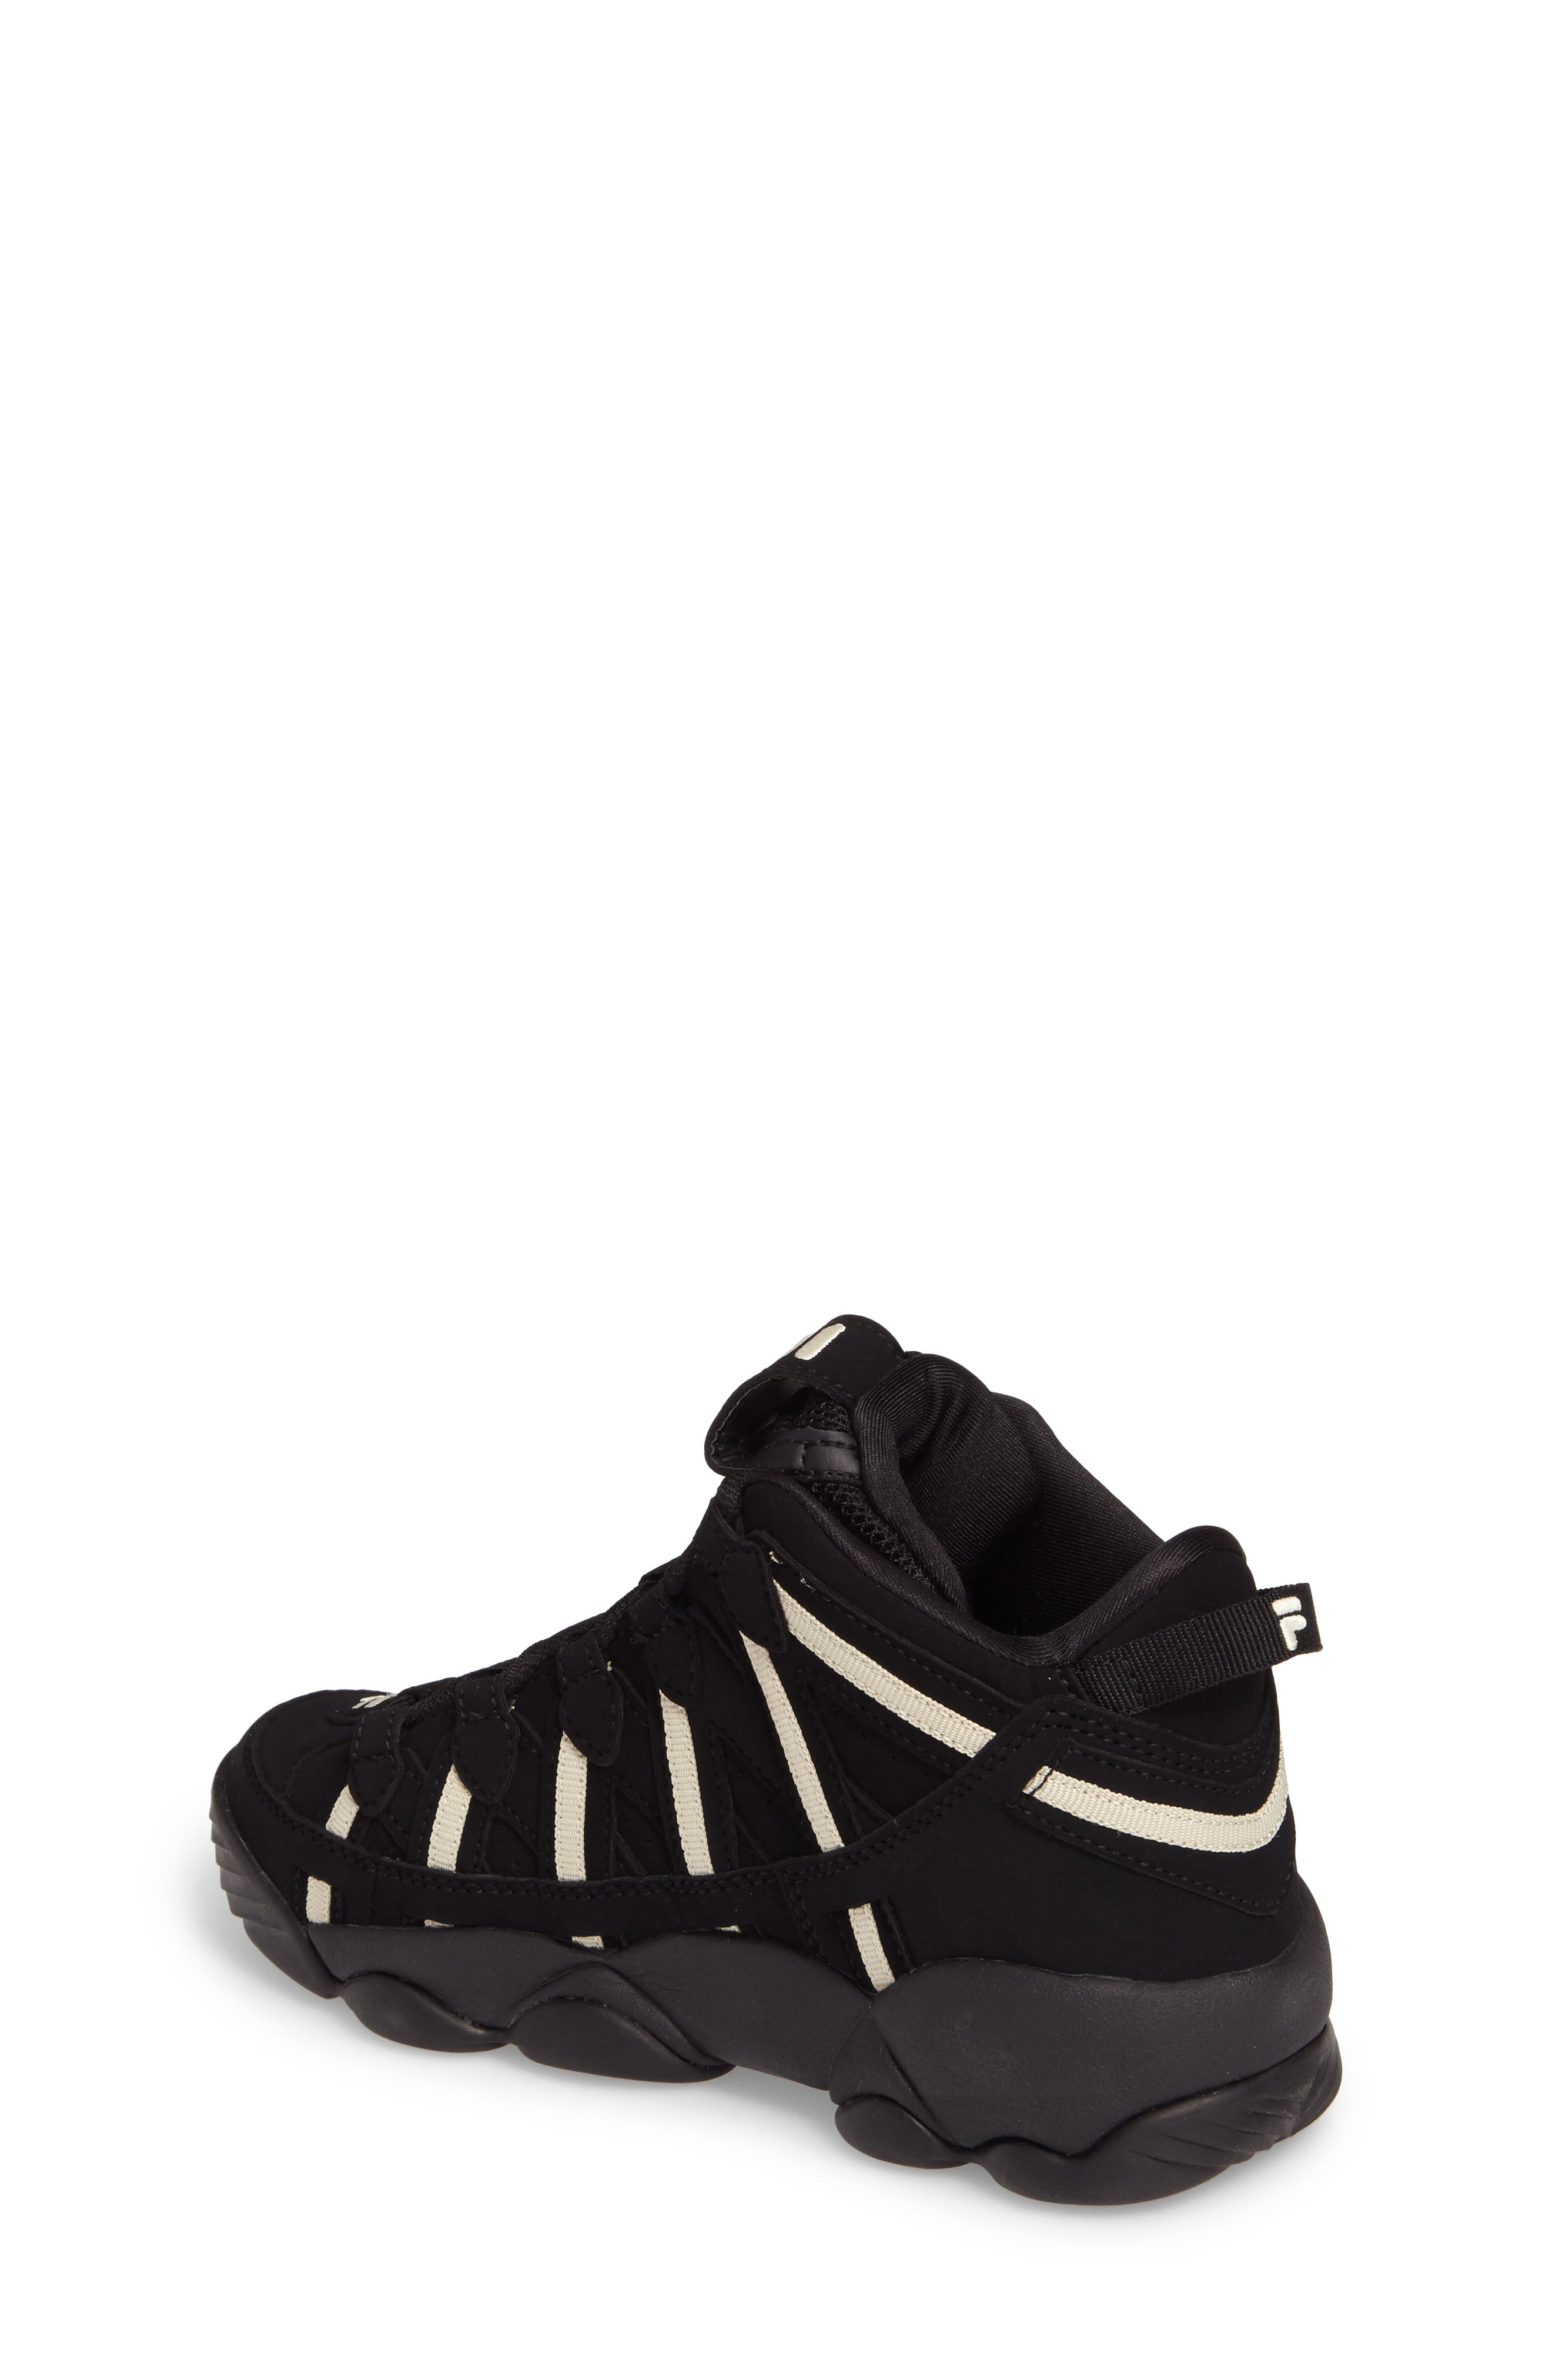 Spaghetti Deluxe Mid Top Sneaker,                             Alternate thumbnail 2, color,                             Black/ Cream